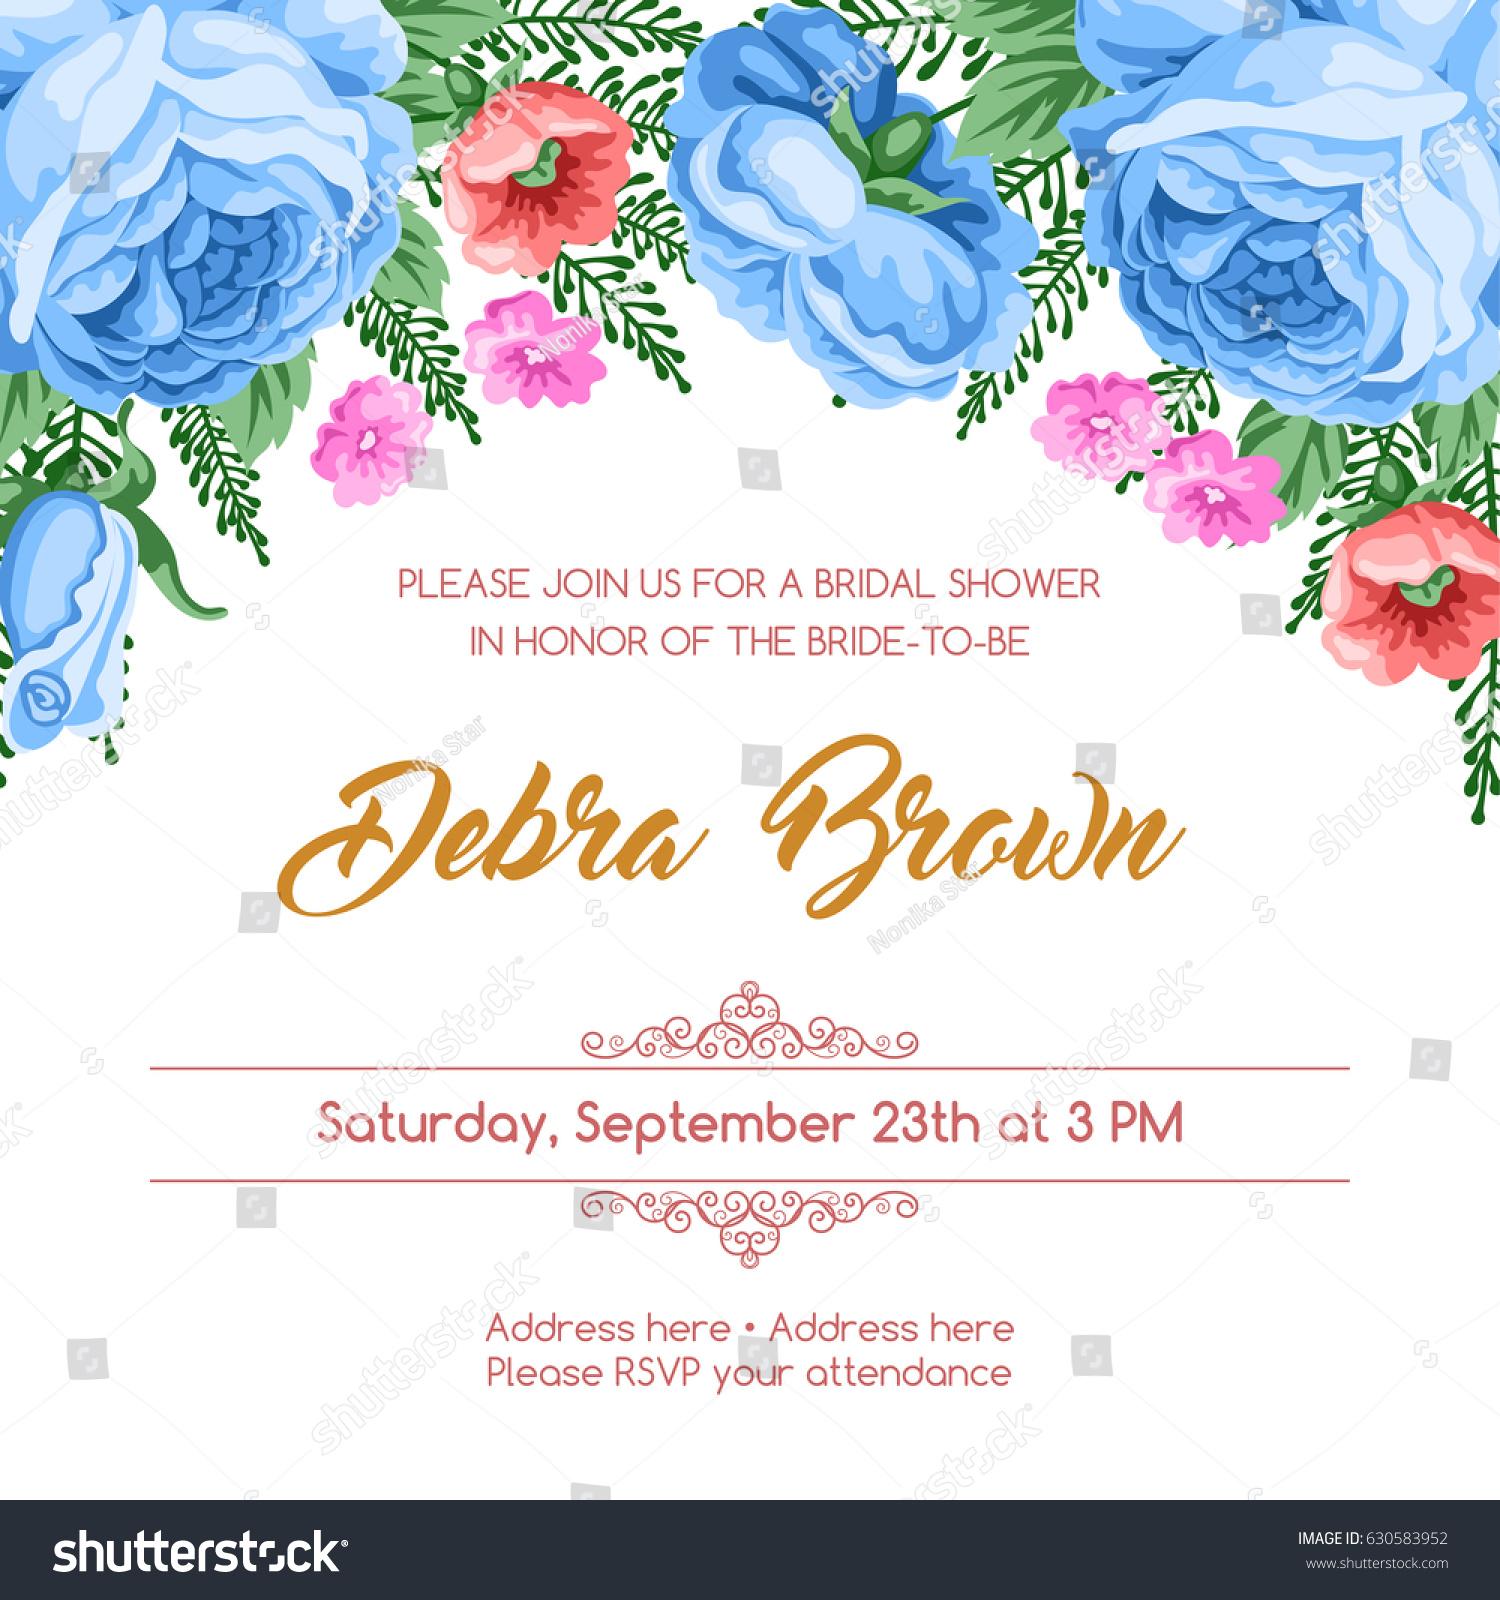 Bridal Shower Invitation Template Flowers Vector Stock Vector ...